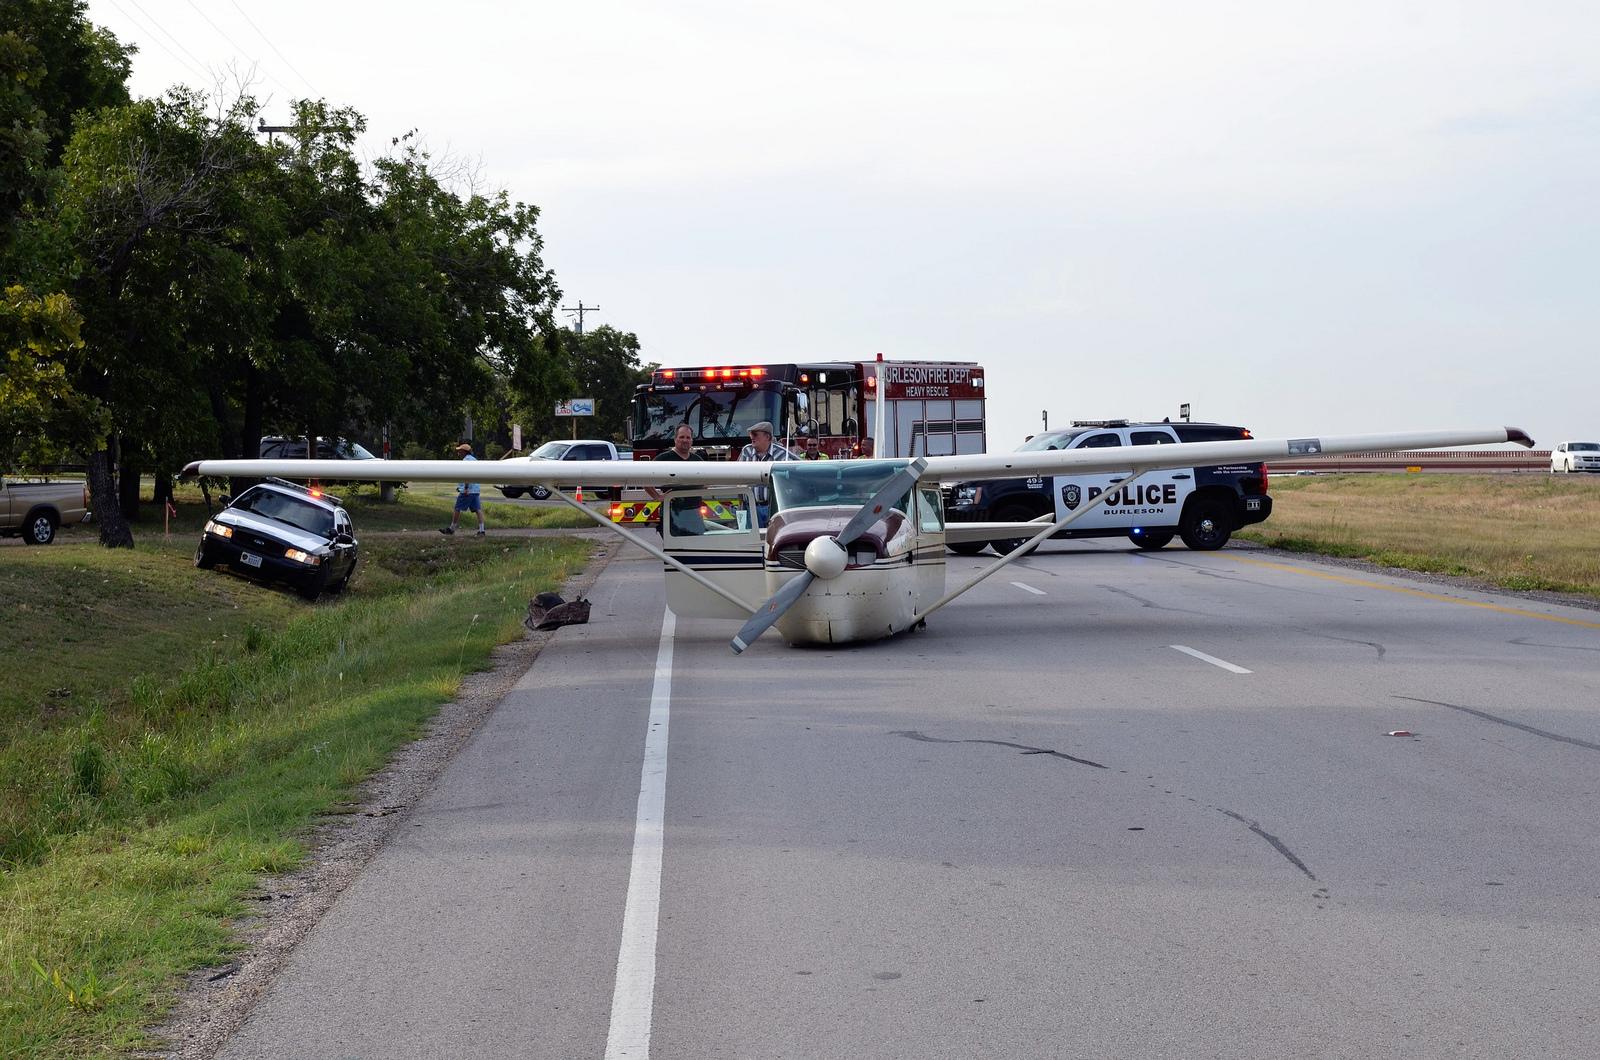 Cessna 182RG Emergency Landing near Fort Worth, Texas